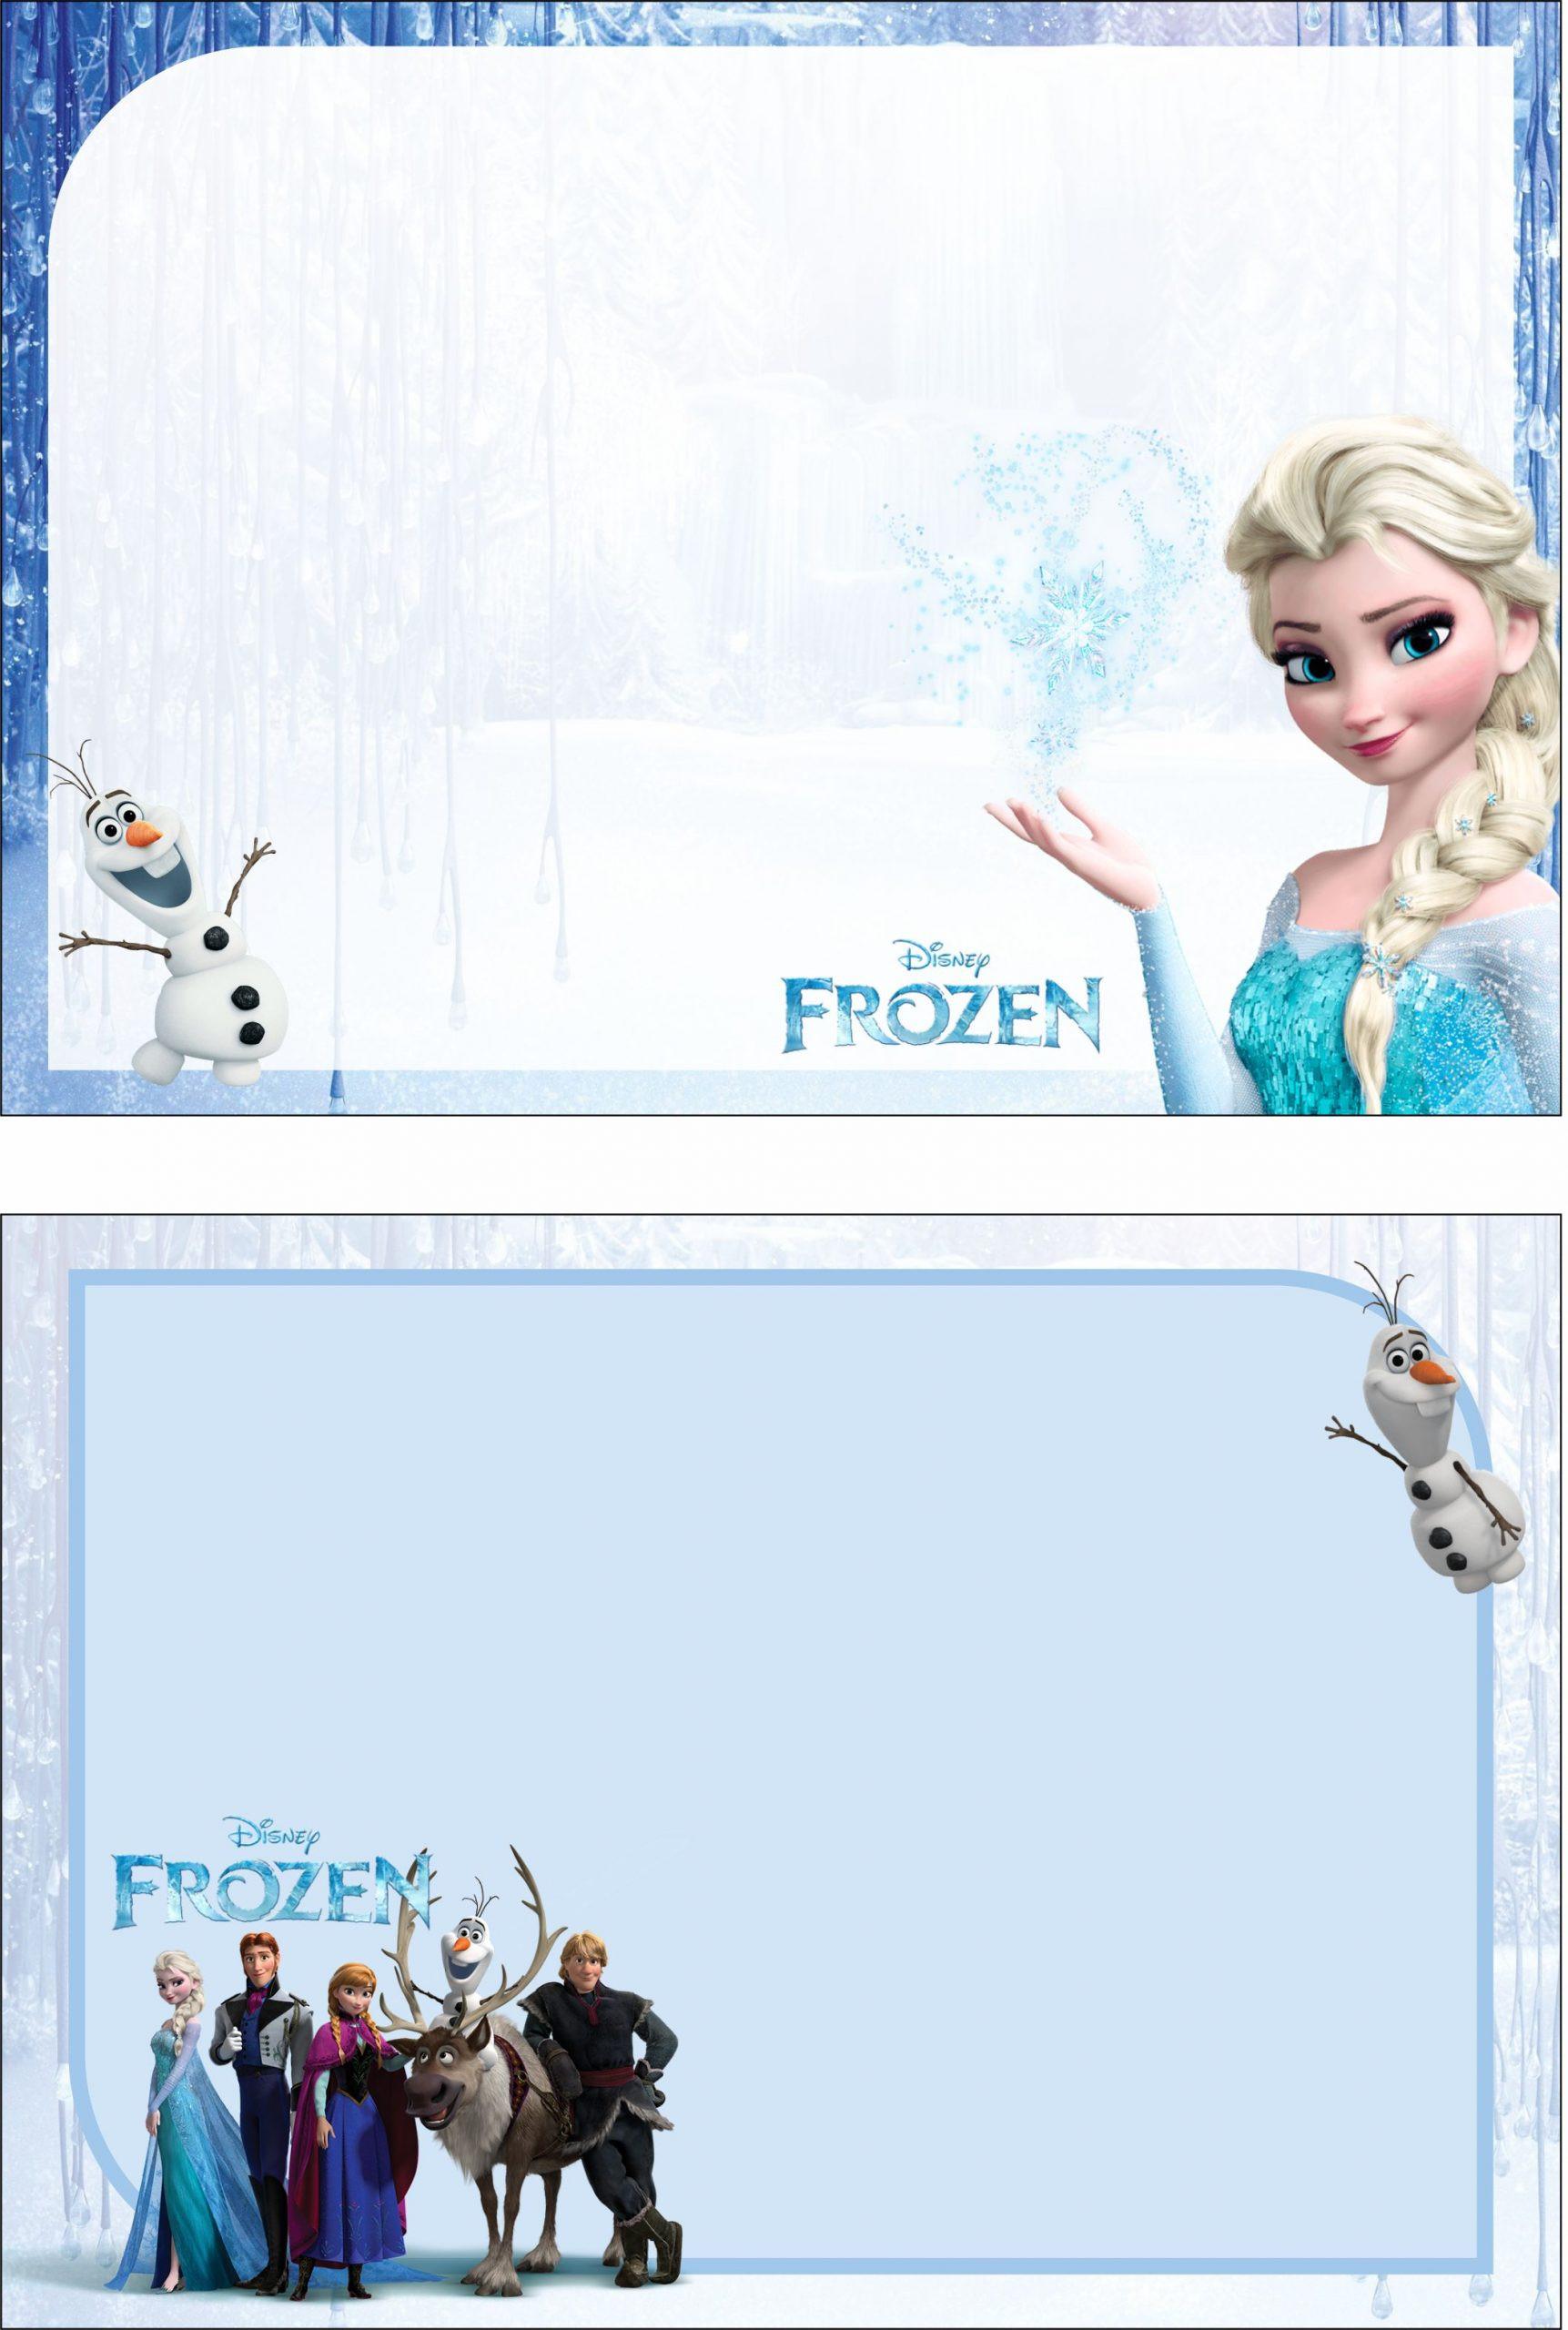 Free Frozen Invitations Printable Free – Frozen 2 Birthday Party Kit Templates – Free